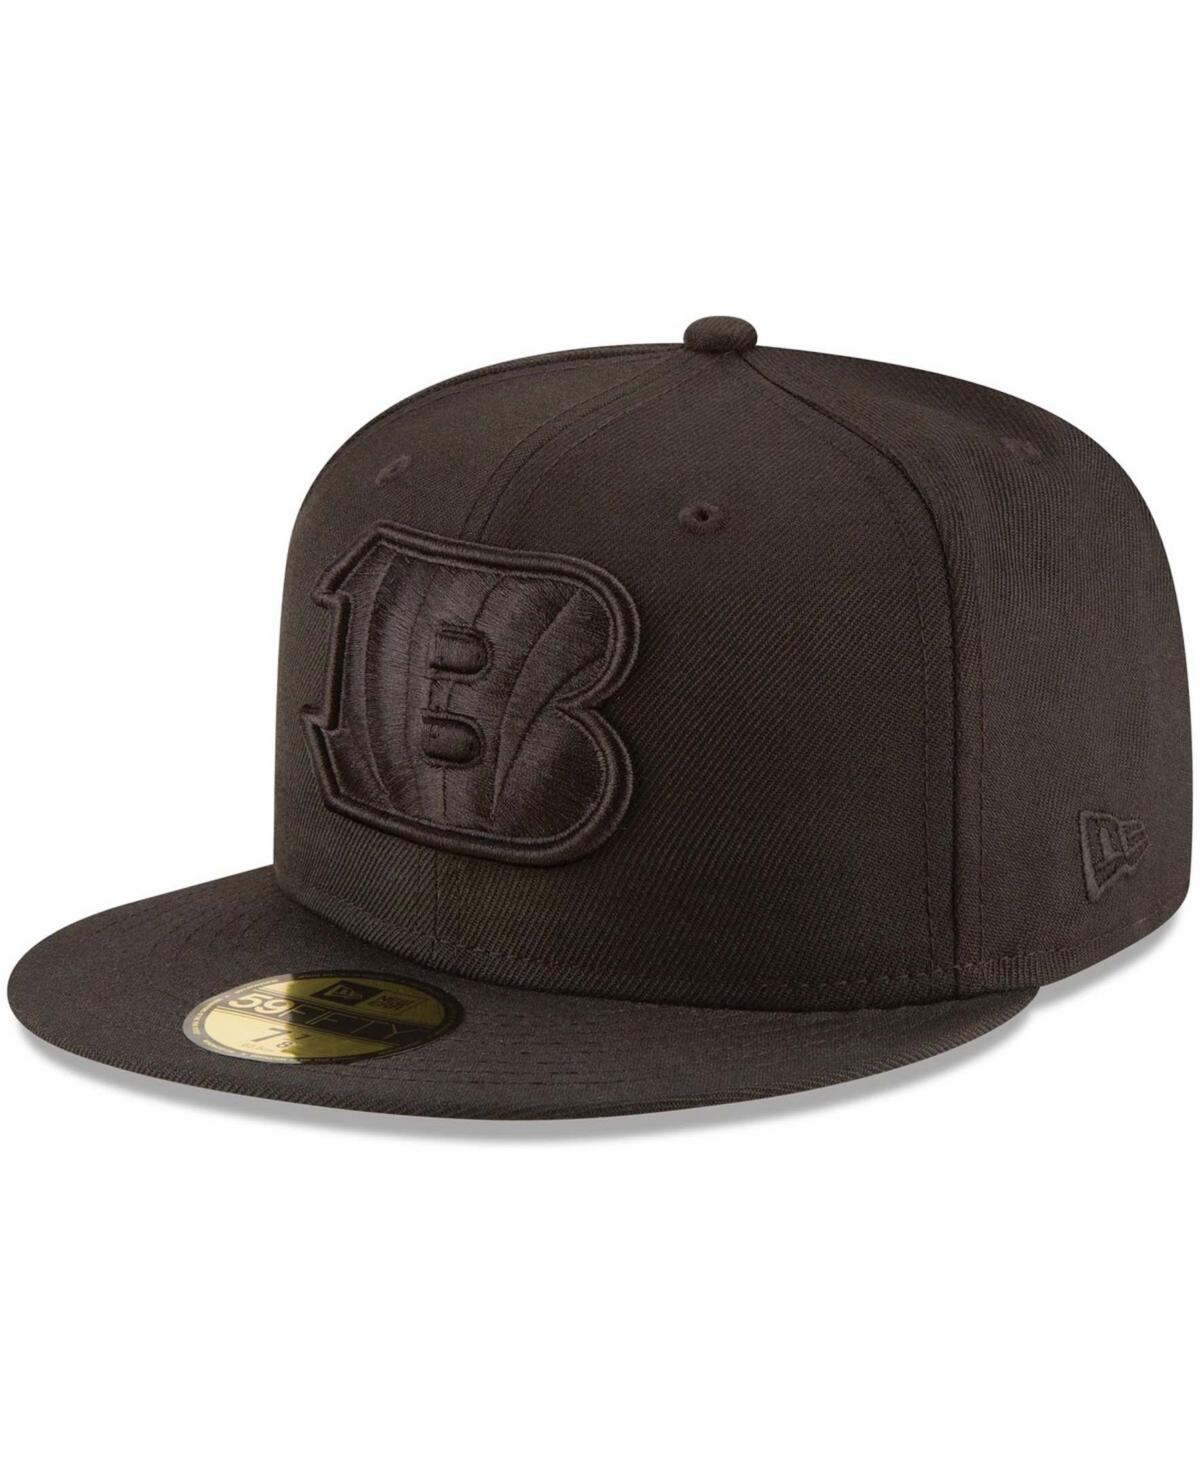 Men's Cincinnati Bengals Black on Black 59FIFTY Fitted Hat